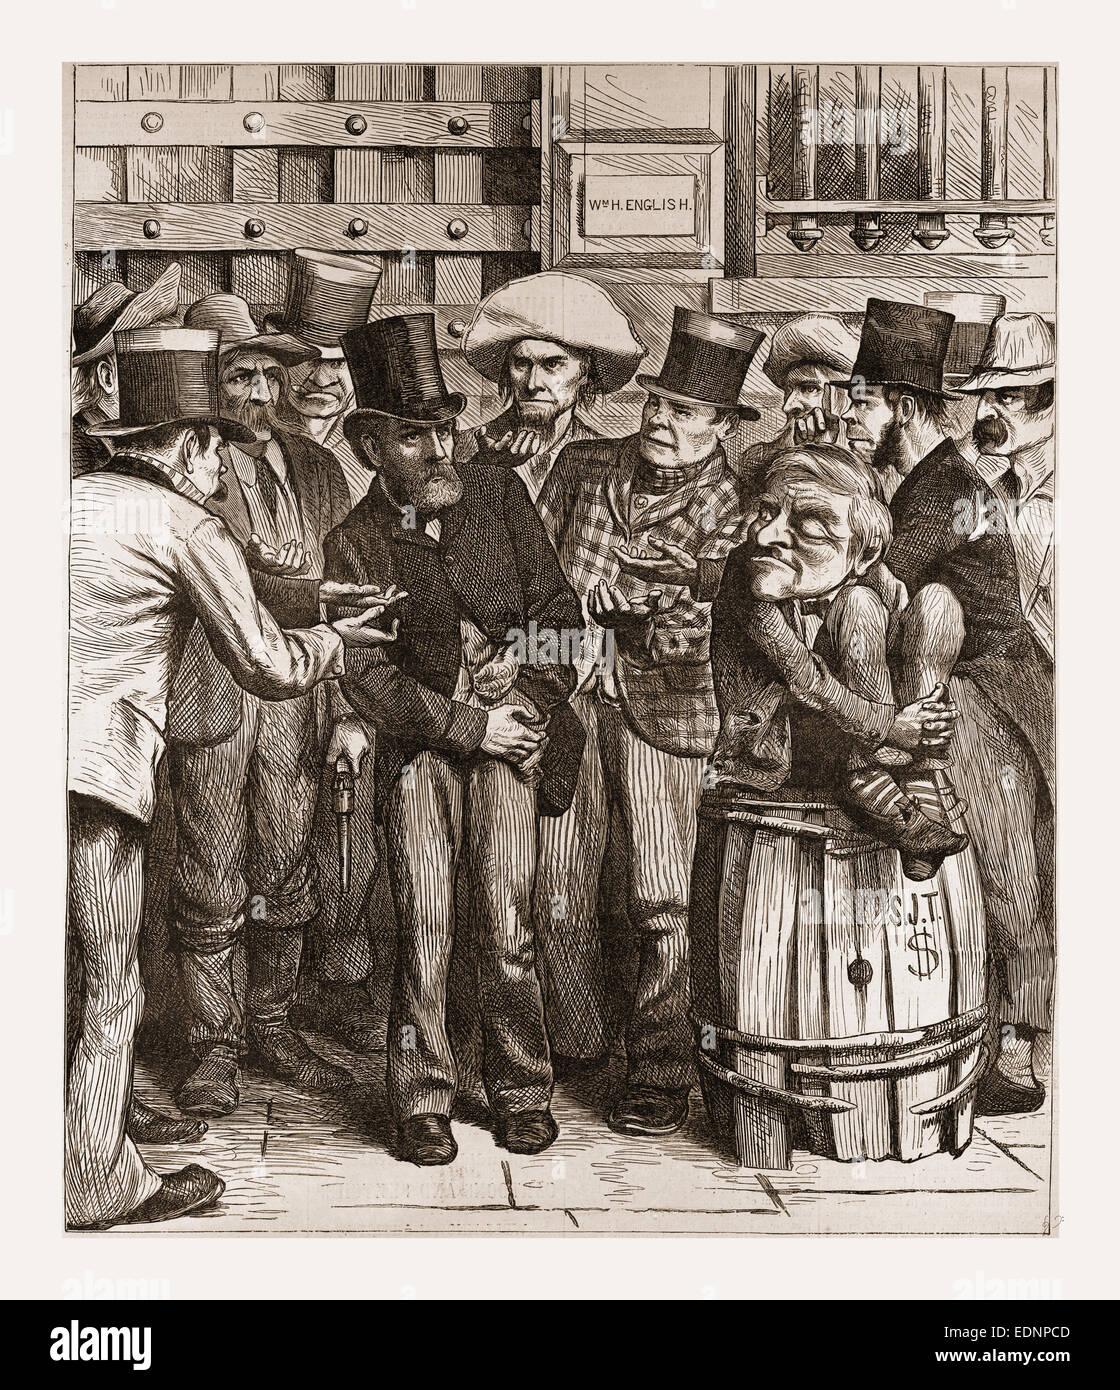 CHORUS OF HUNGRY DEMOCRATS, 1880, 19th century engraving, USA, America - Stock Image